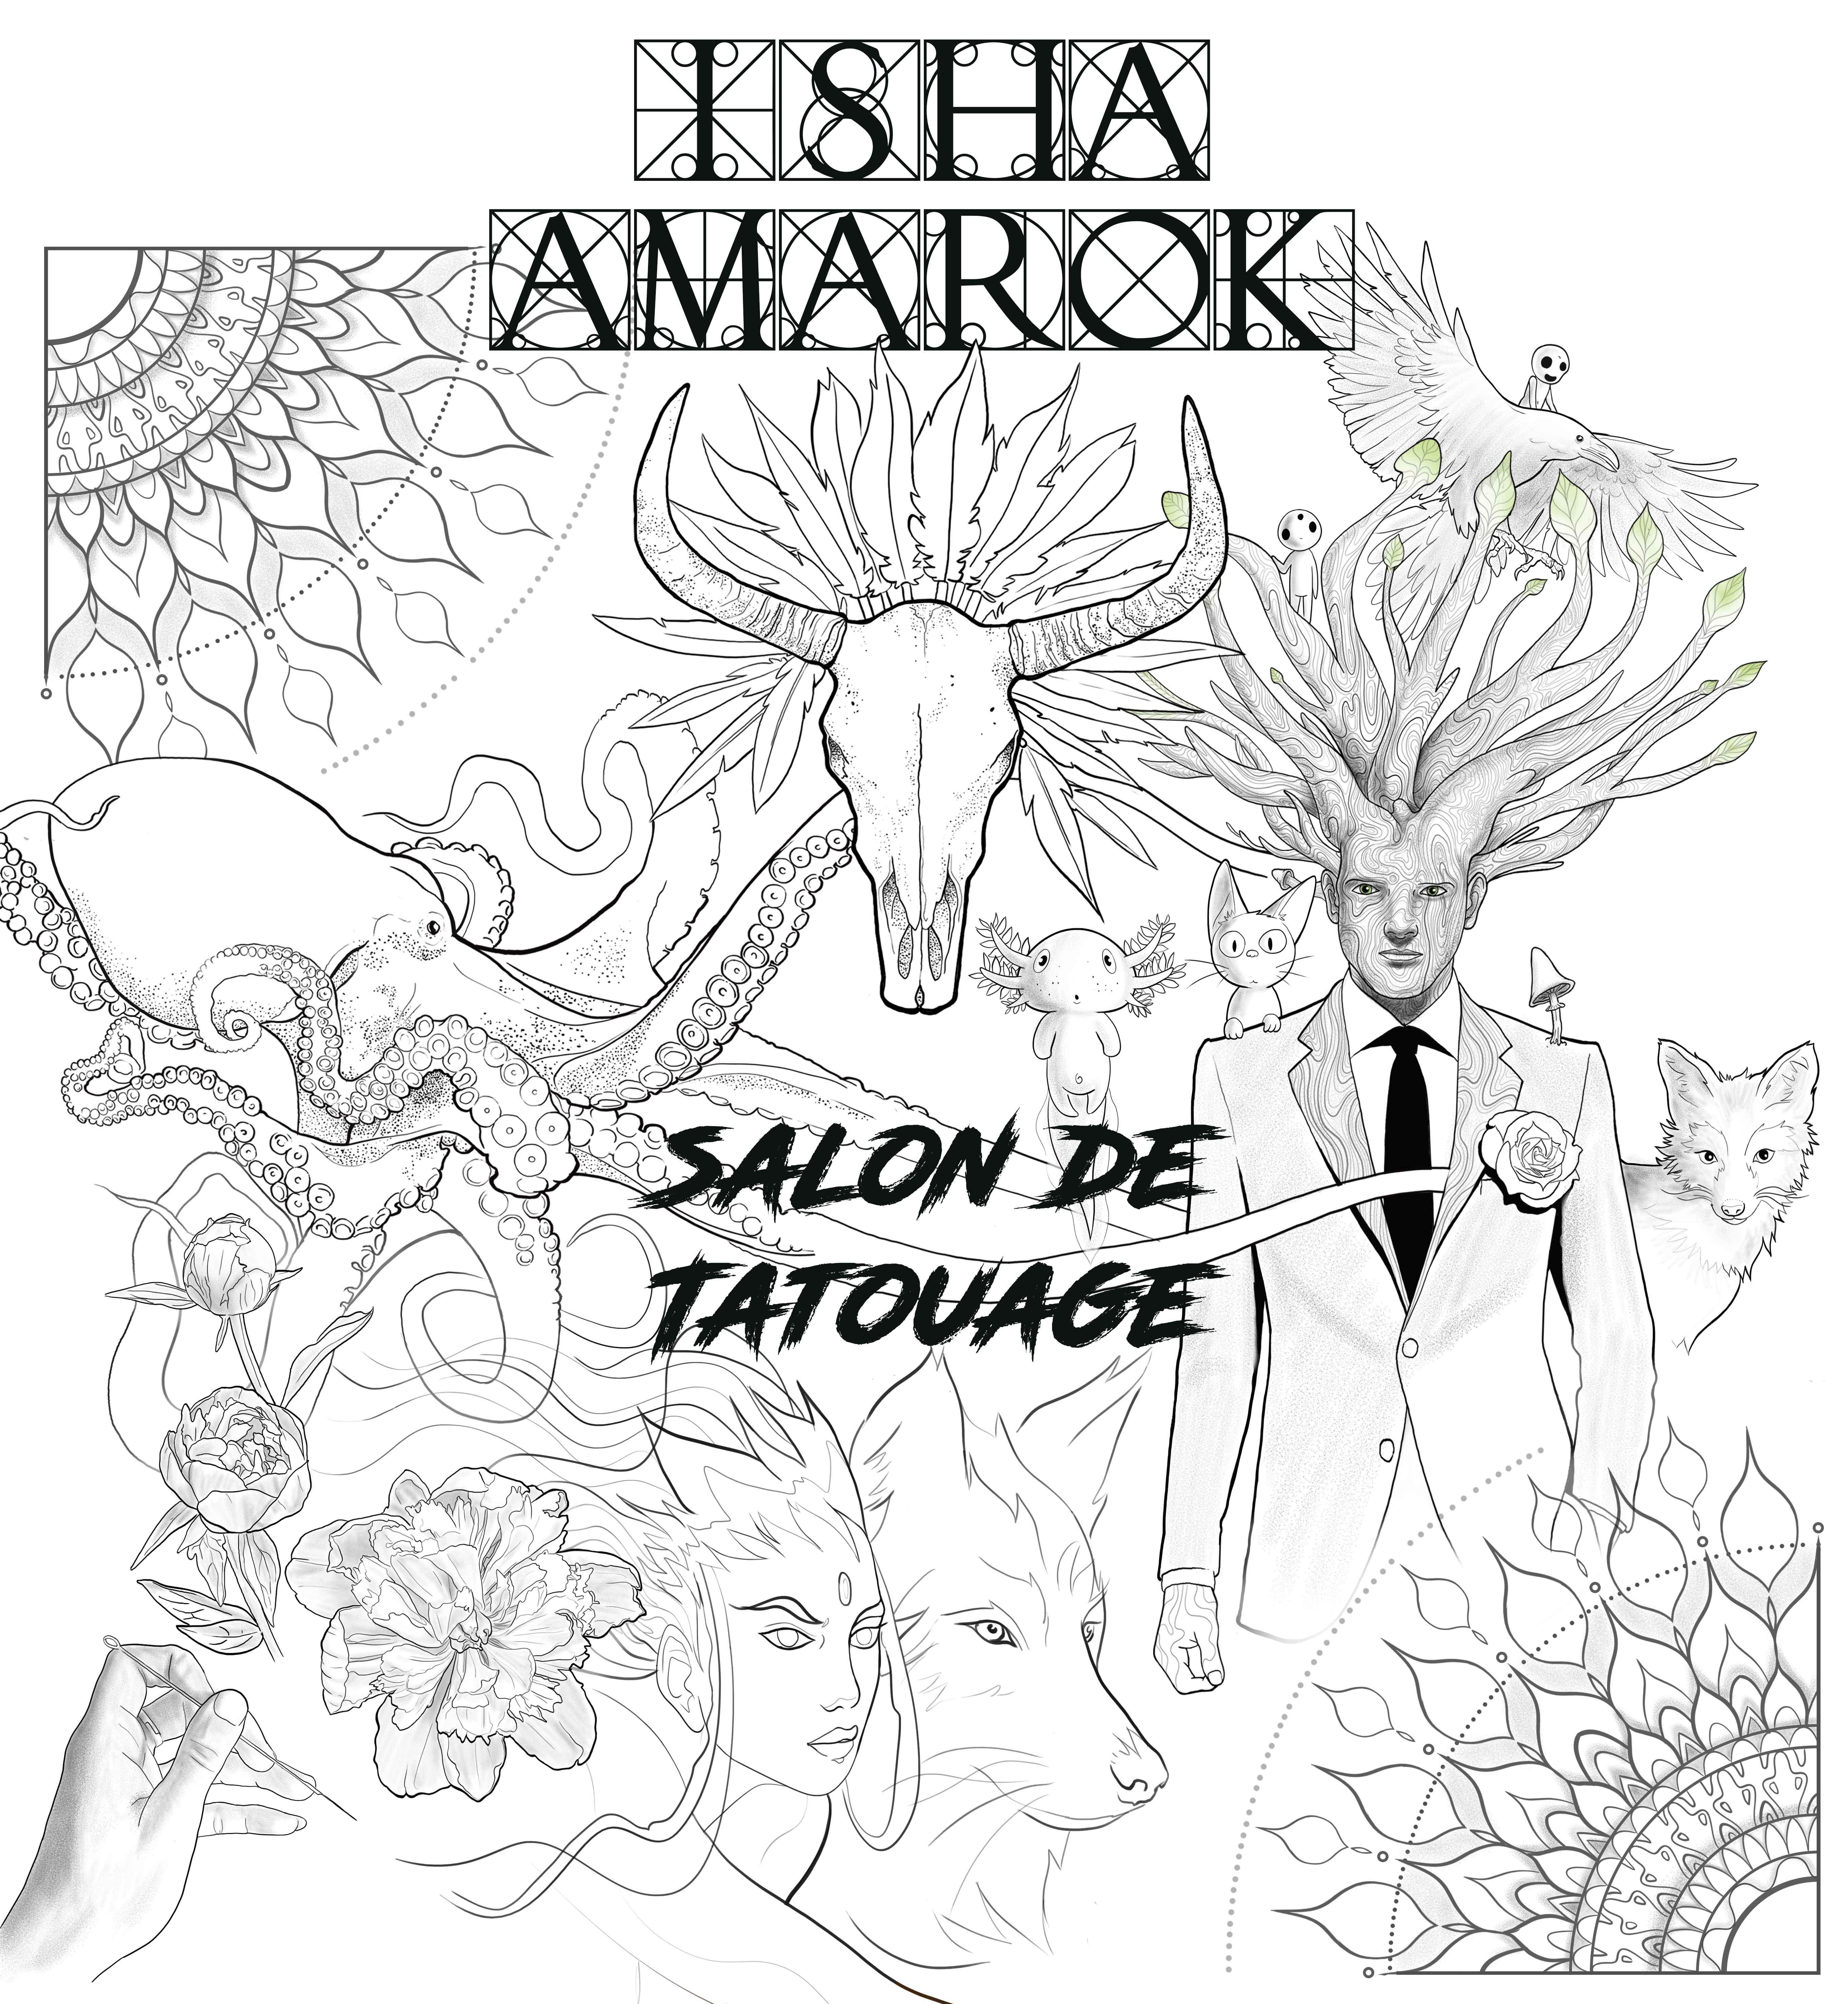 Salon De Tatouage En Ariege Okpal